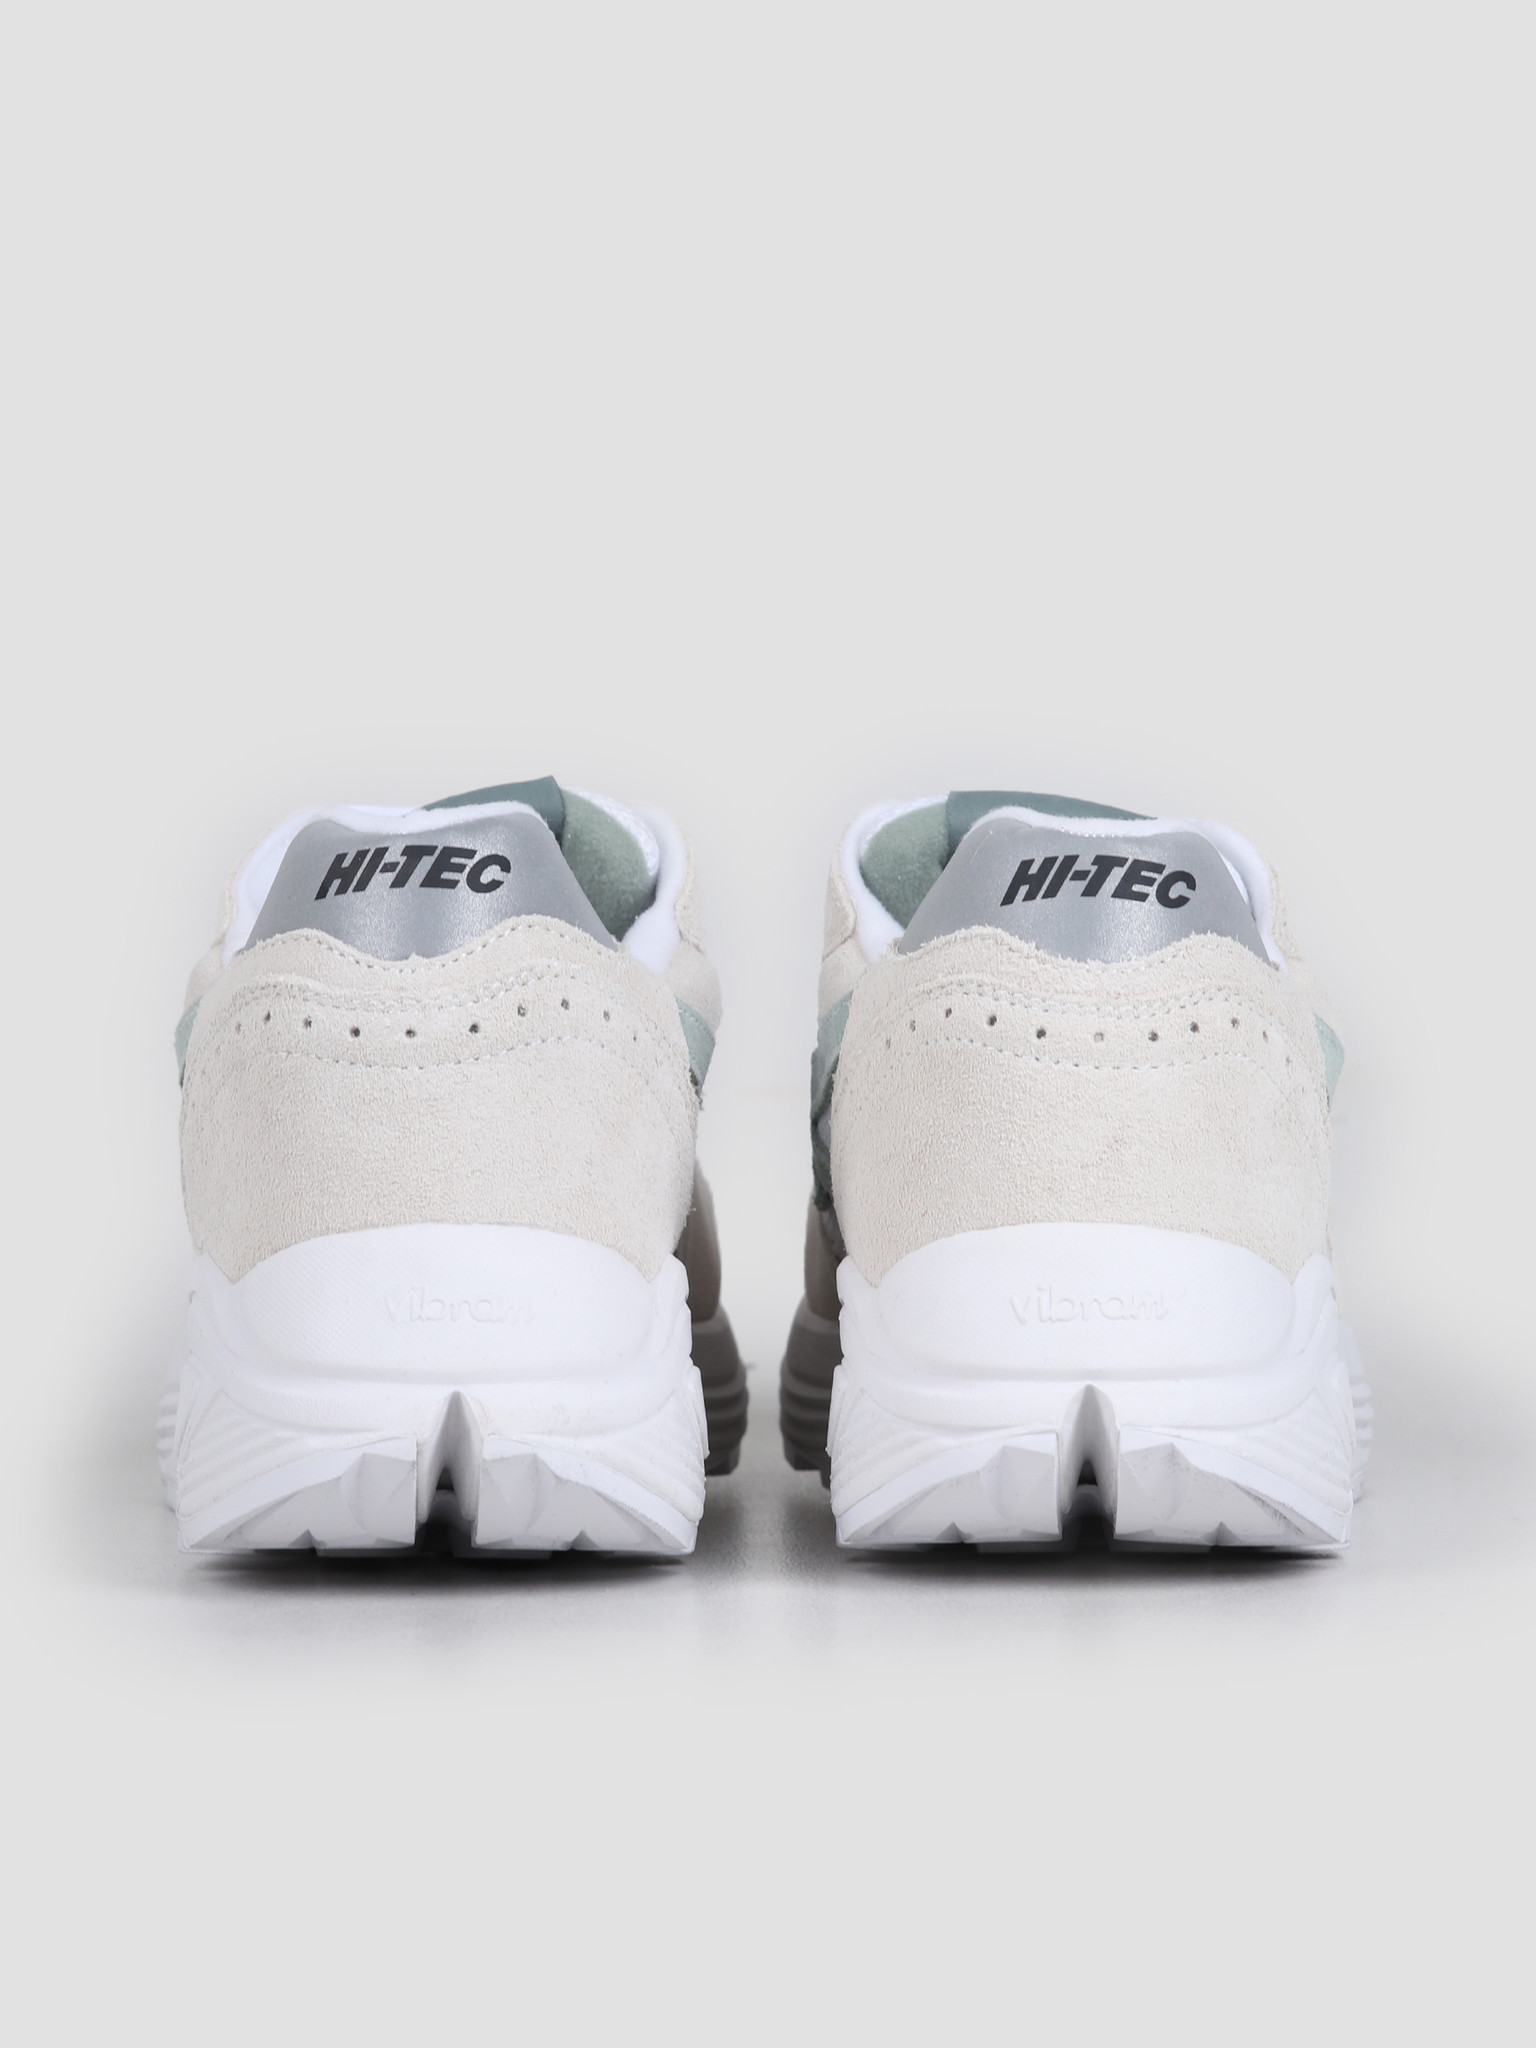 Hi-Tec Hi-Tec HTS Silver Shadow RGS White Sage Green 6273-011